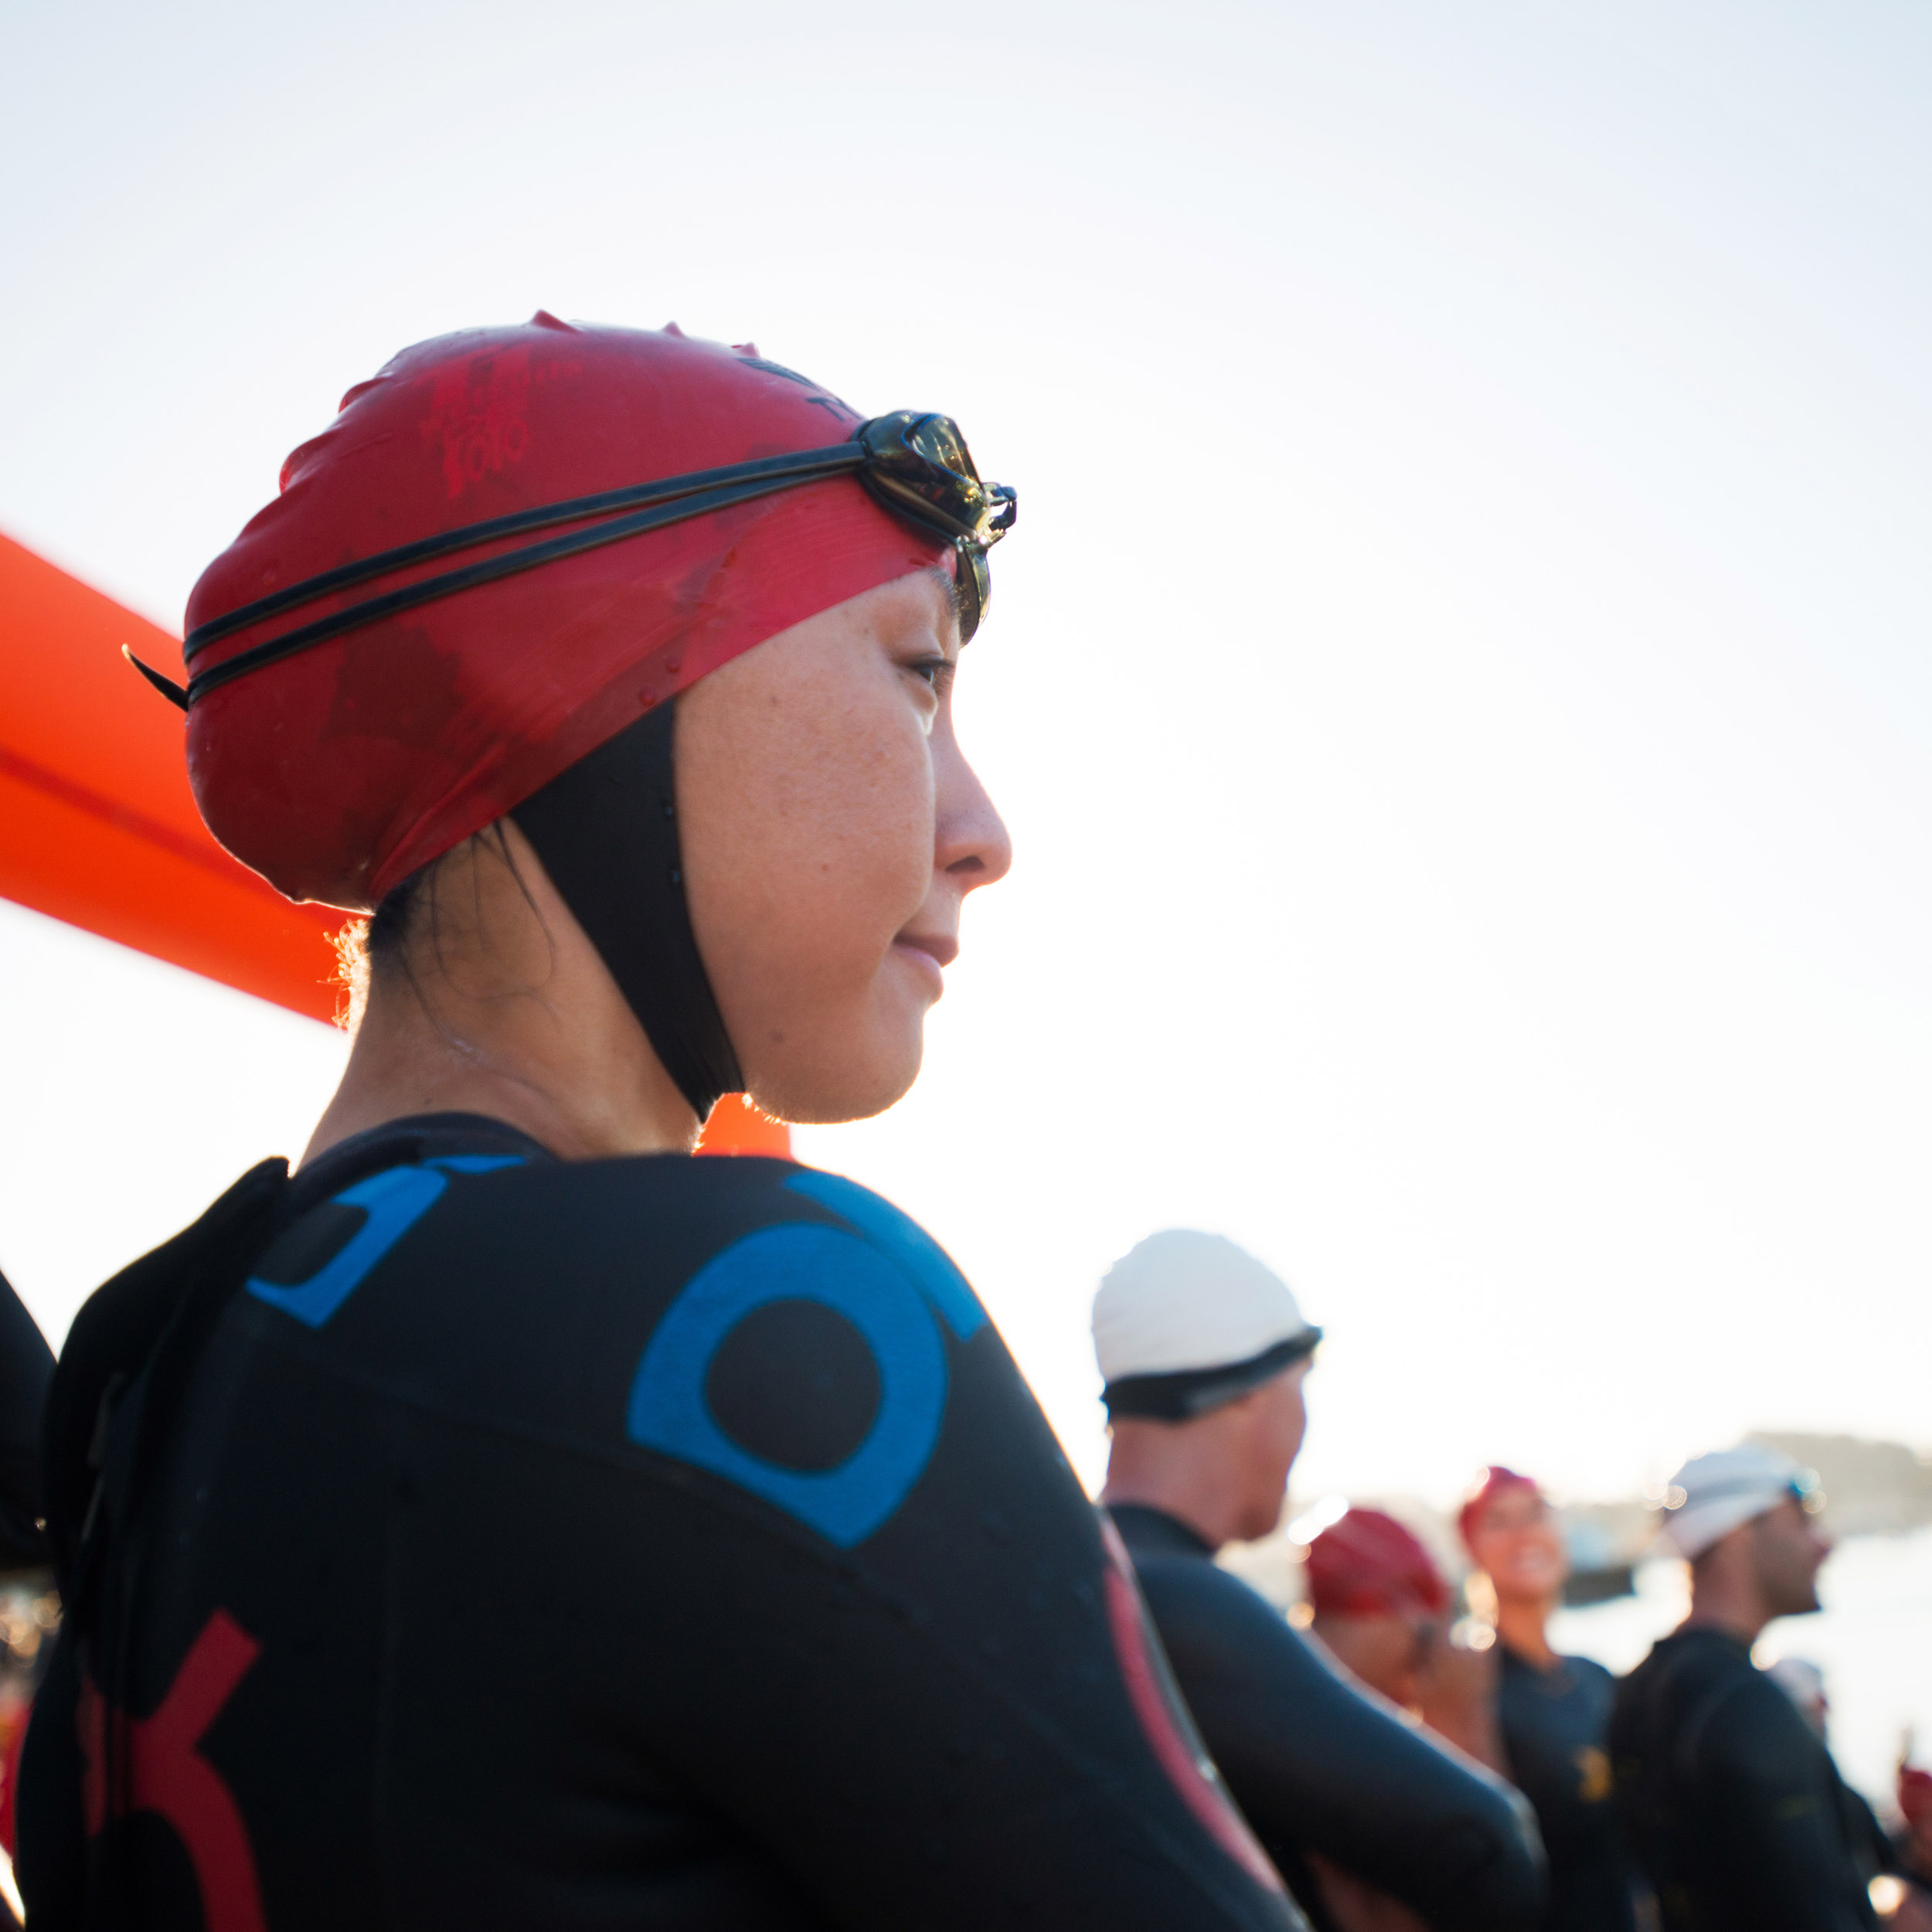 kman_cyclery_traithlon_wetsuit_crop_w.jpg